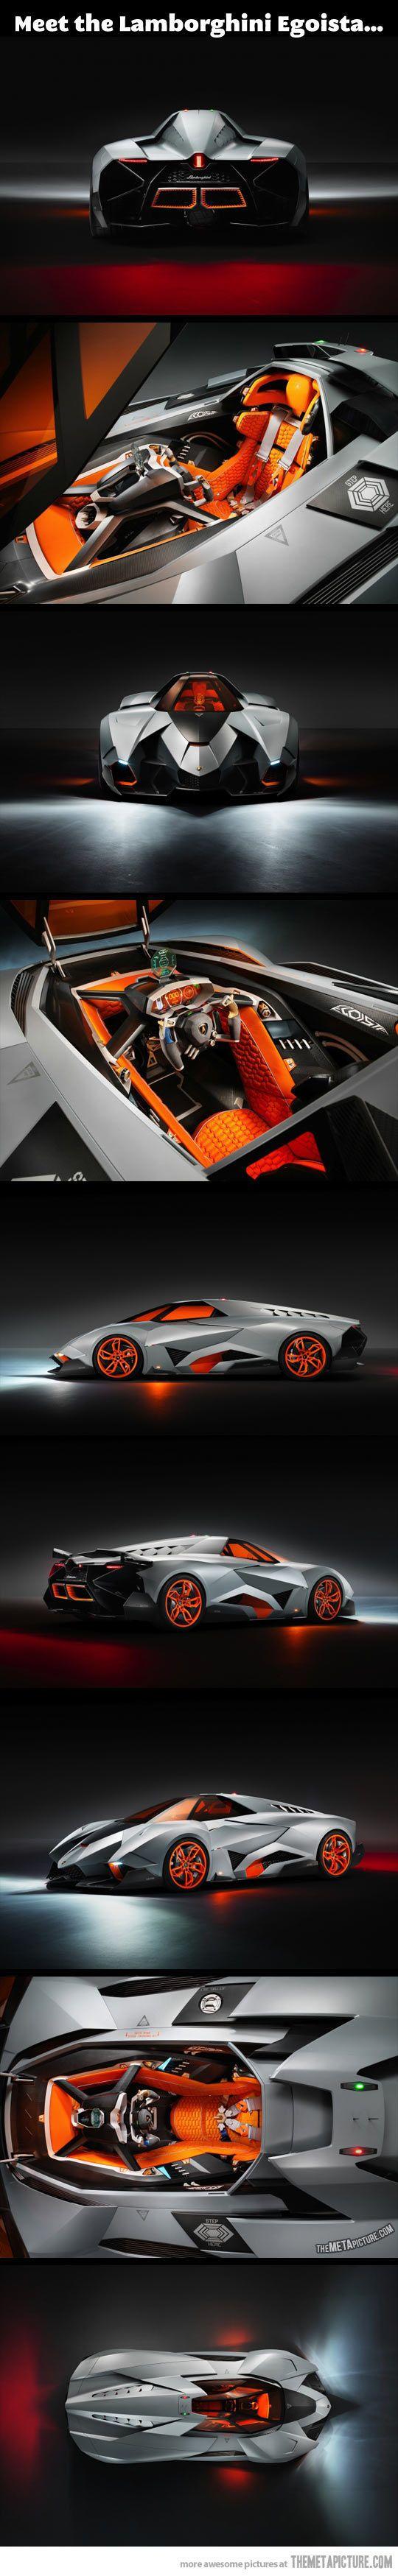 Forget the Batmobile, I want the Lamborghini Egoista... - The Meta Picture